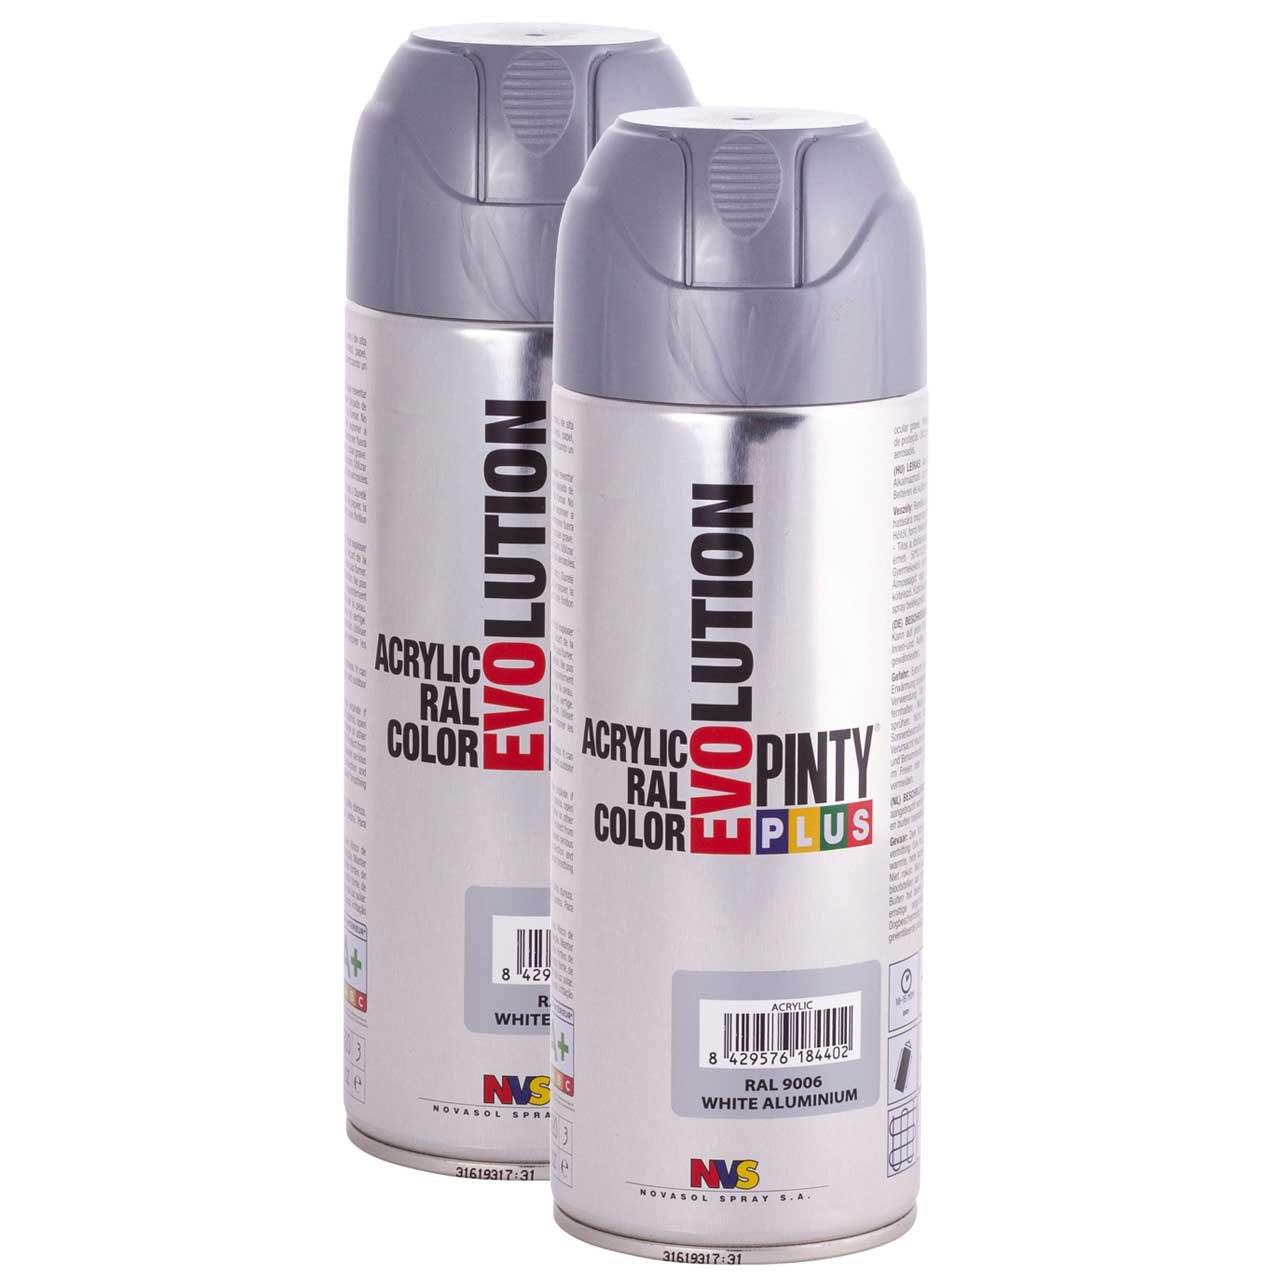 Fast Dry, Low Odor, Low VOC - Acrylic Spray Paint PintyPlus Evolution - Pack of 2 (White Aluminum)